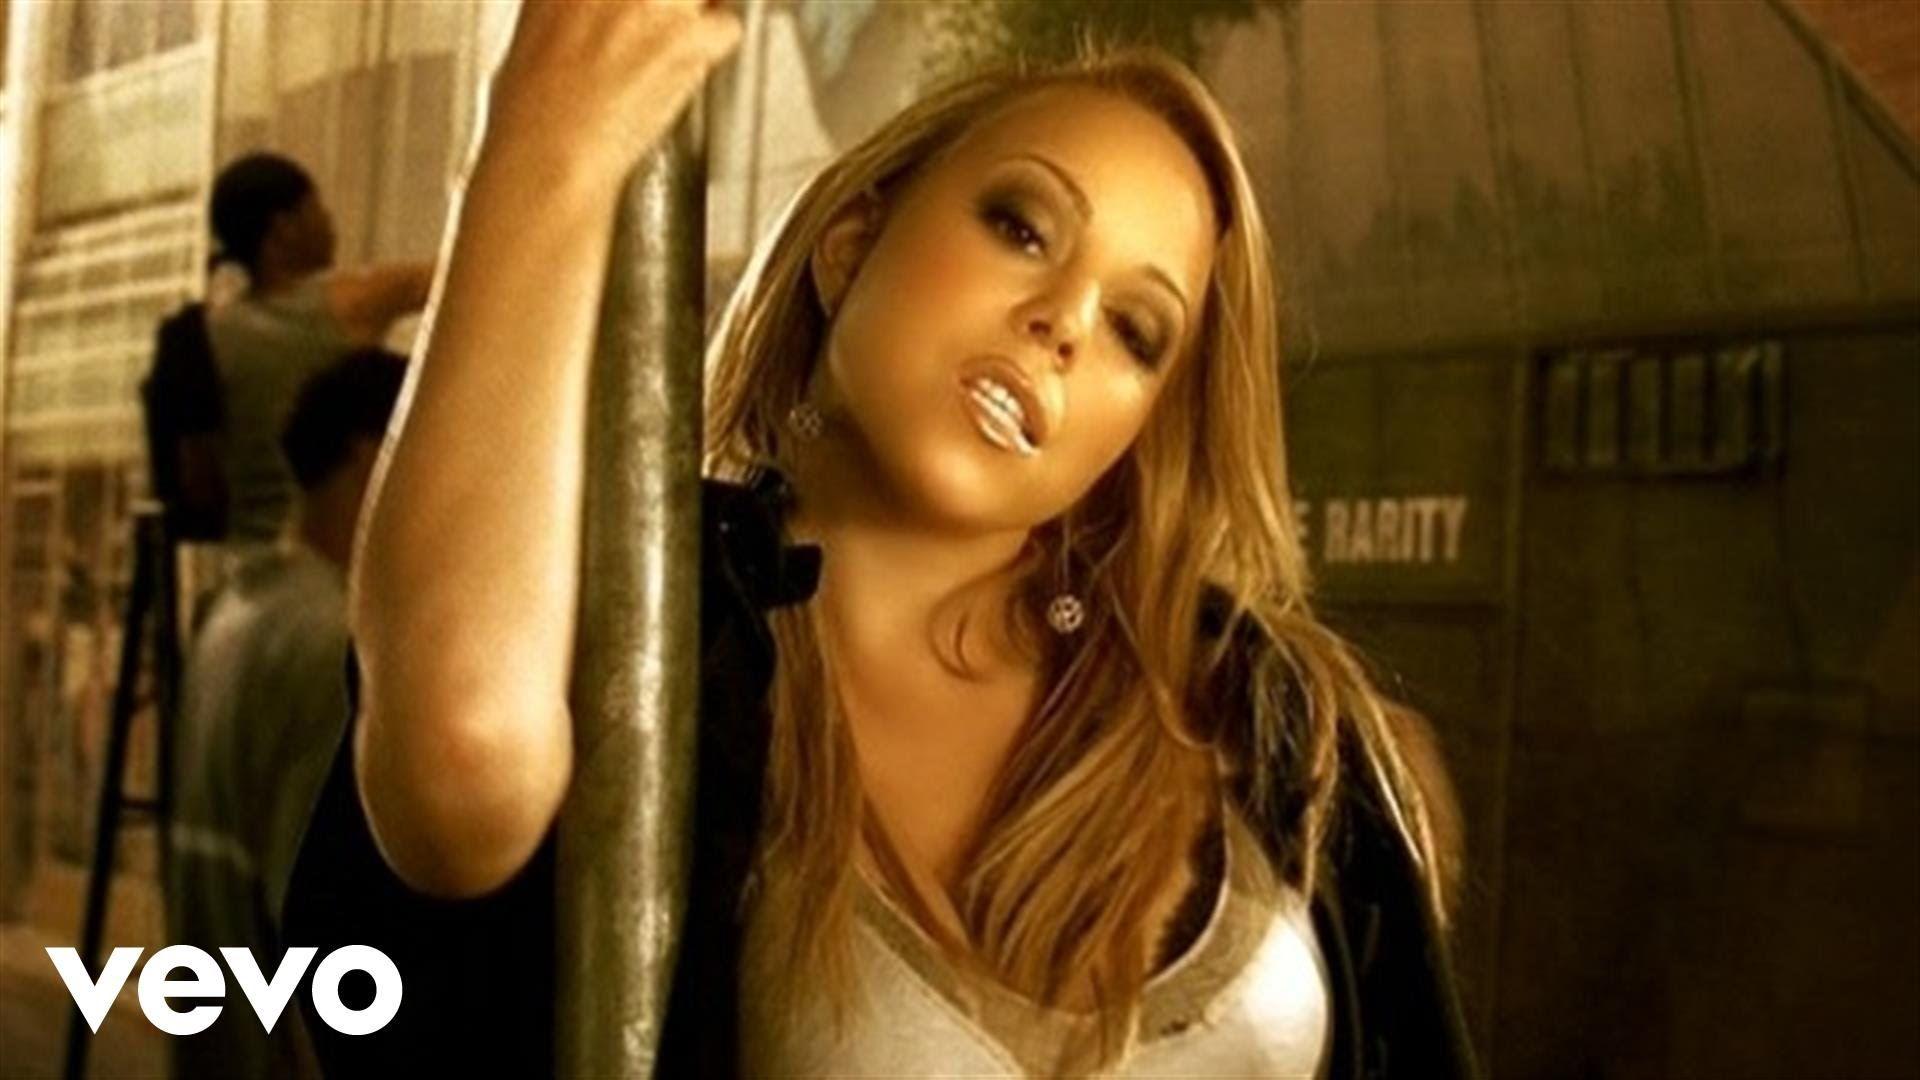 Mariah Carey Shake It Off for Throwback Thursday